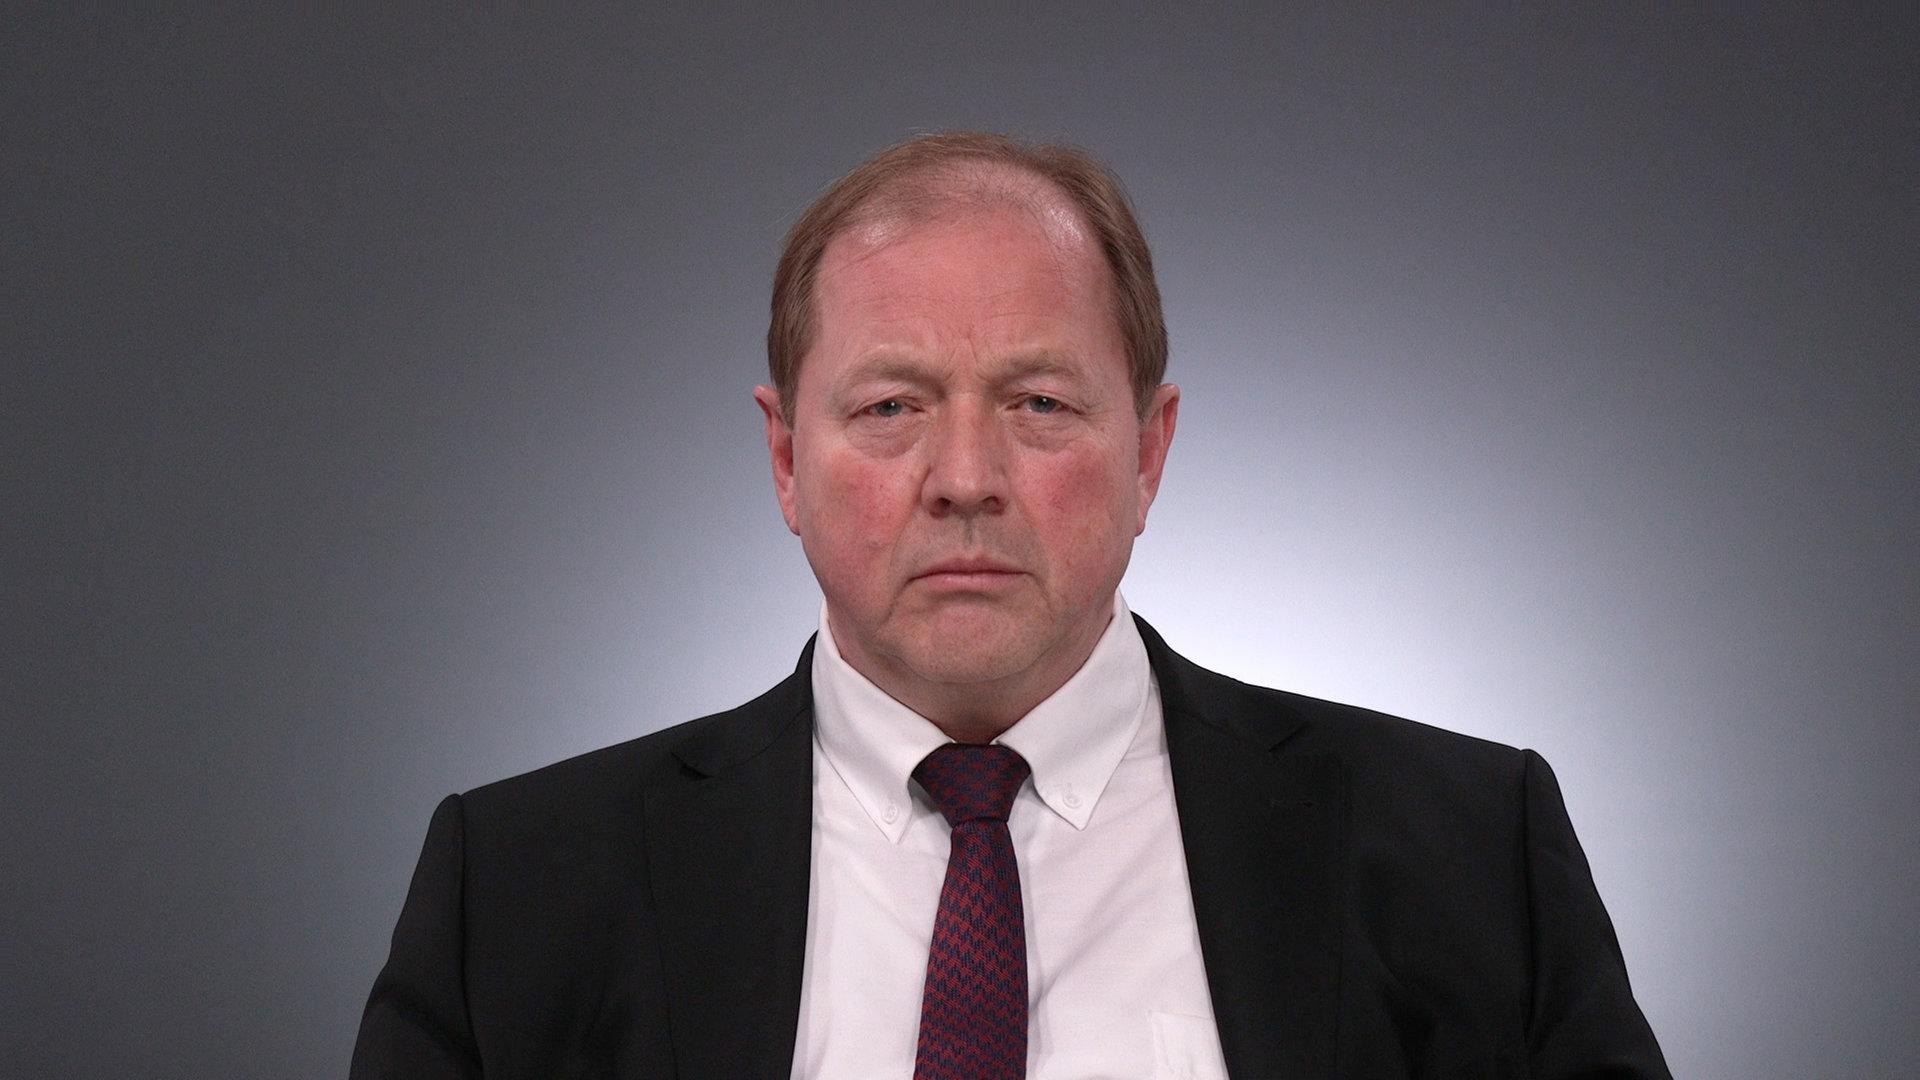 Dirk Nockemann, AfD